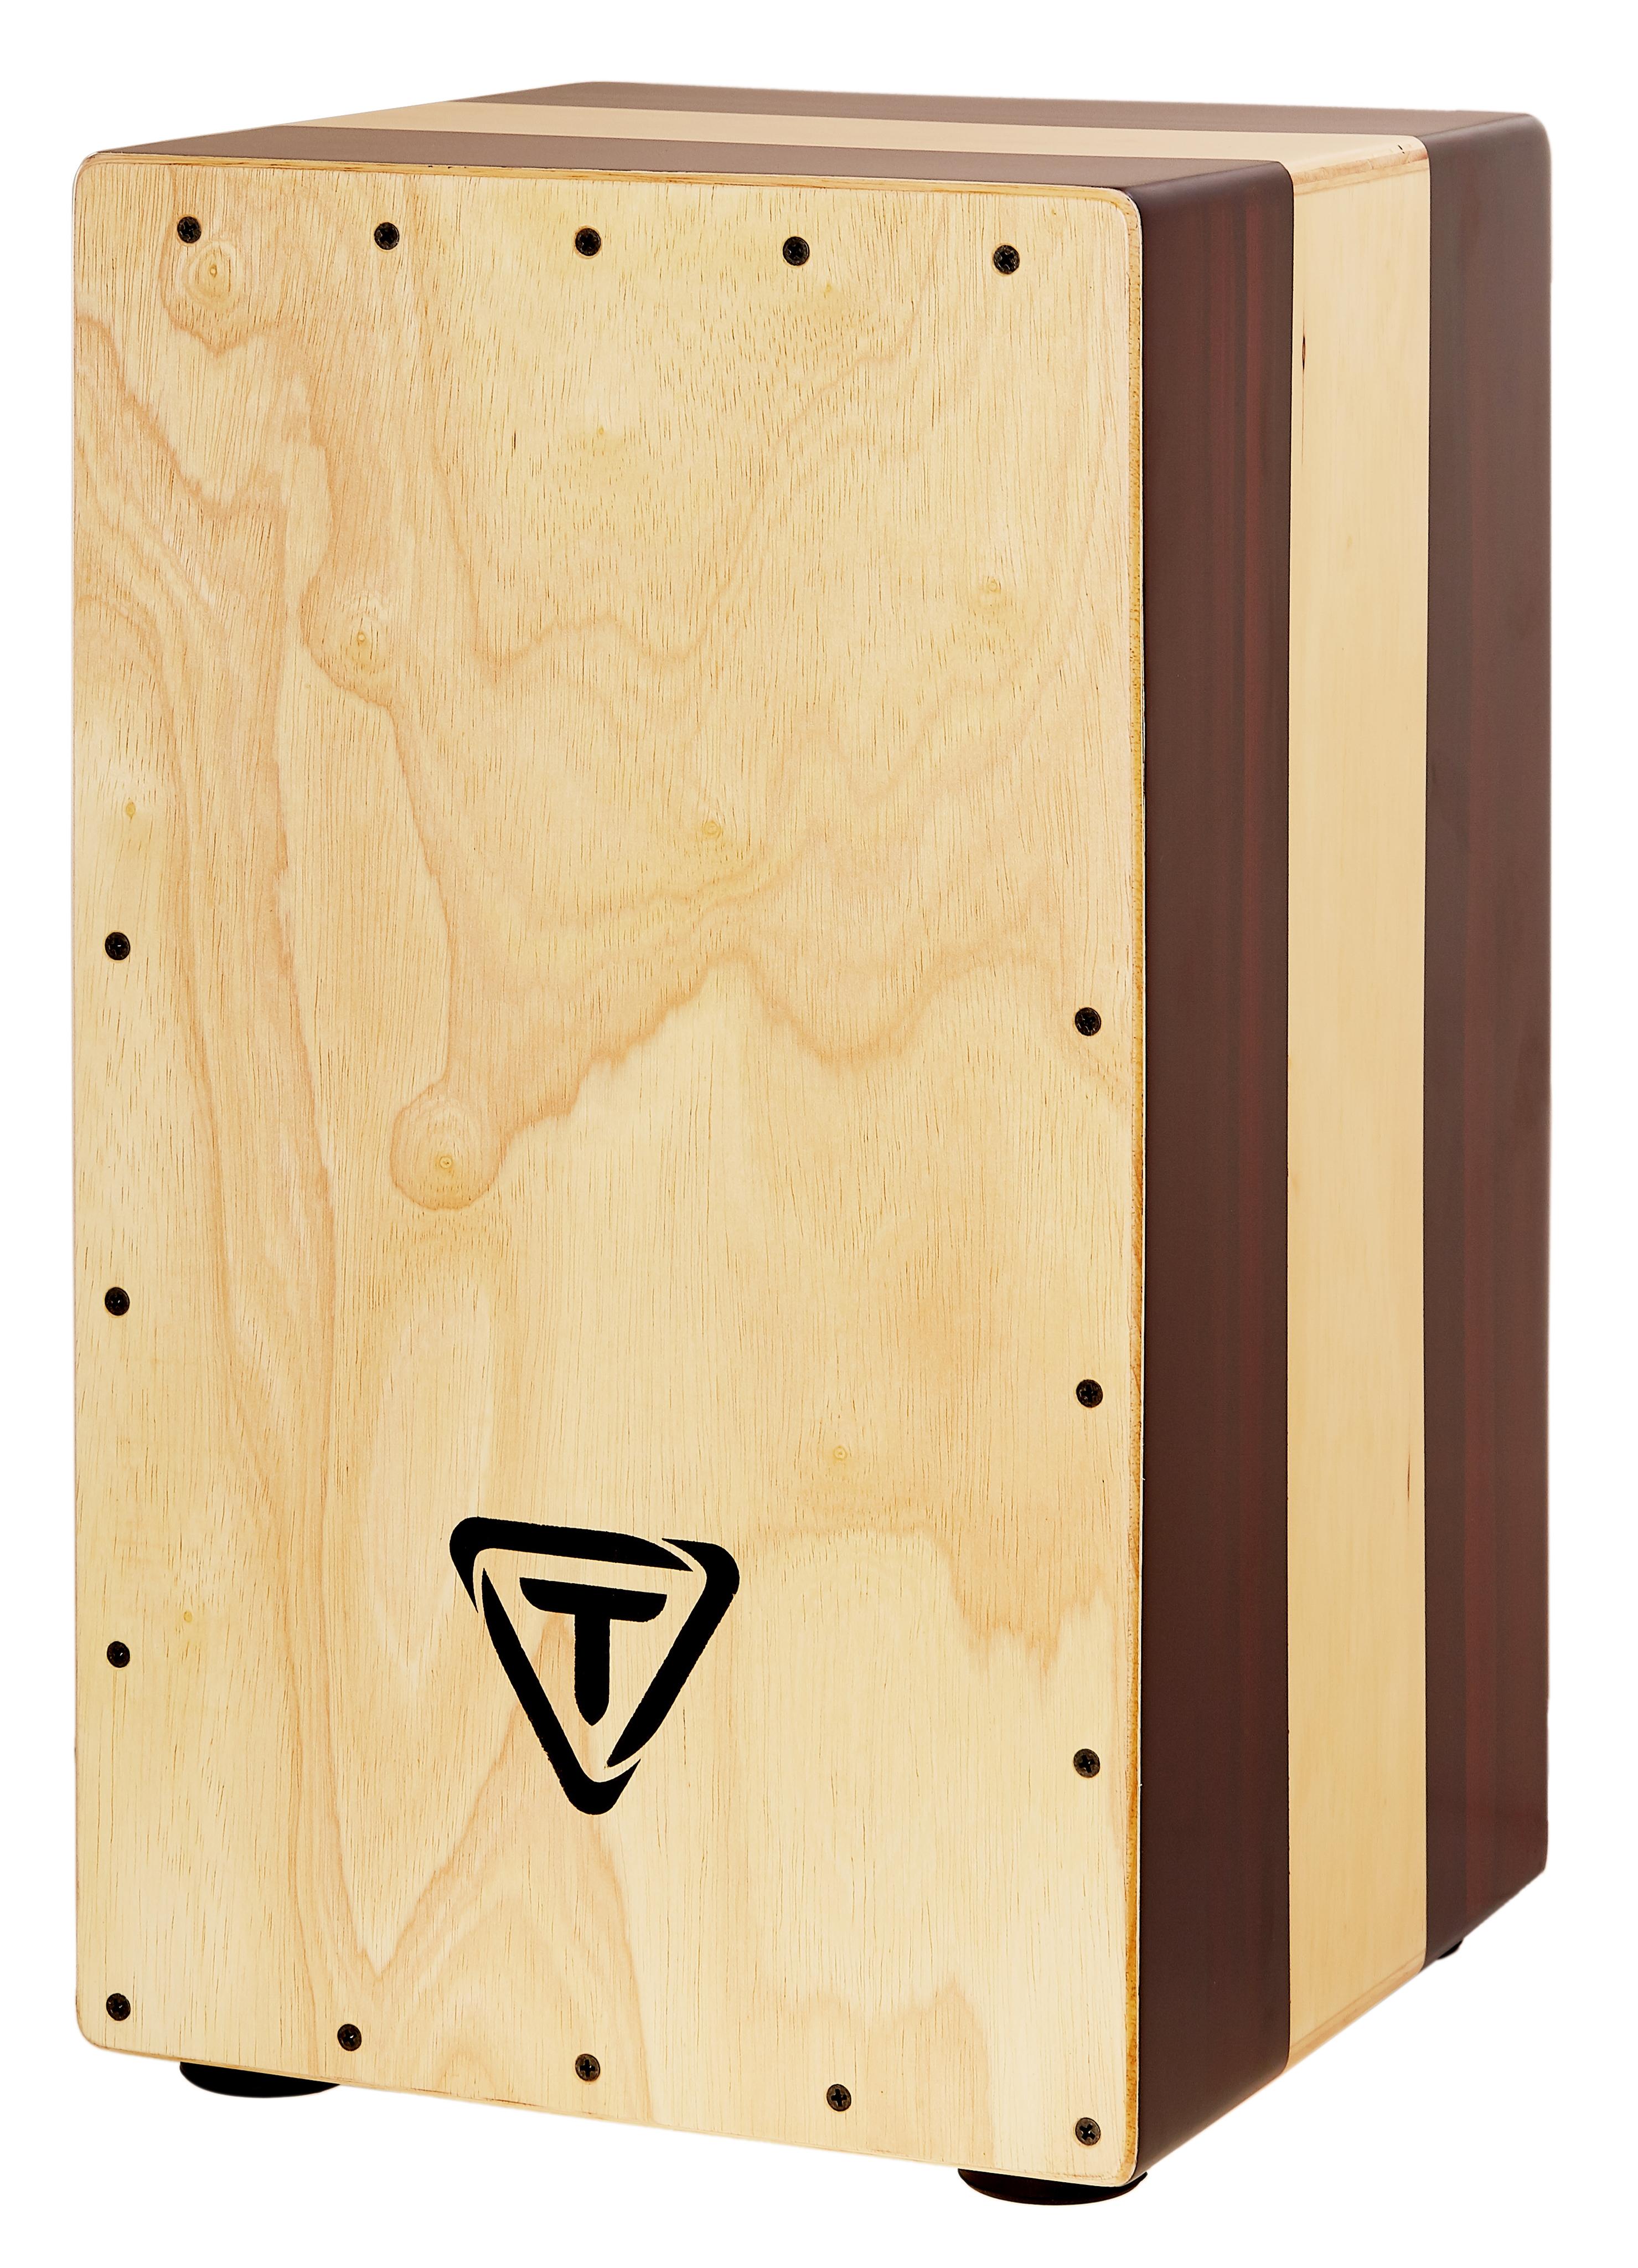 TYCOON TKRE-29 Artist Series Retro Cajon